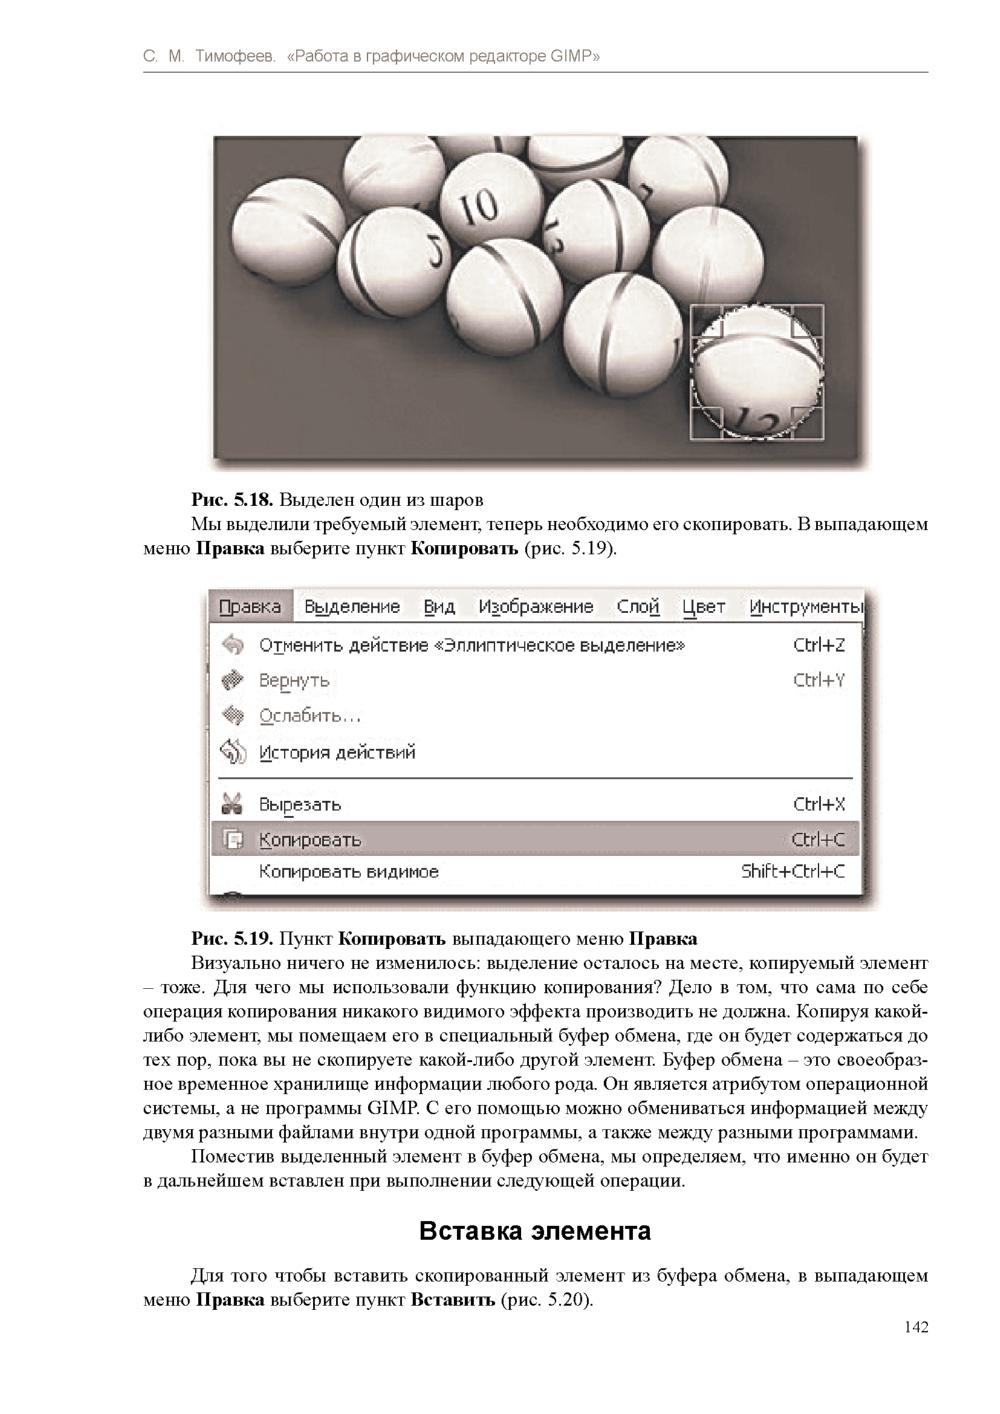 http://i5.imageban.ru/out/2013/12/13/fd076d8fa4585c31a3684486b3433444.jpg